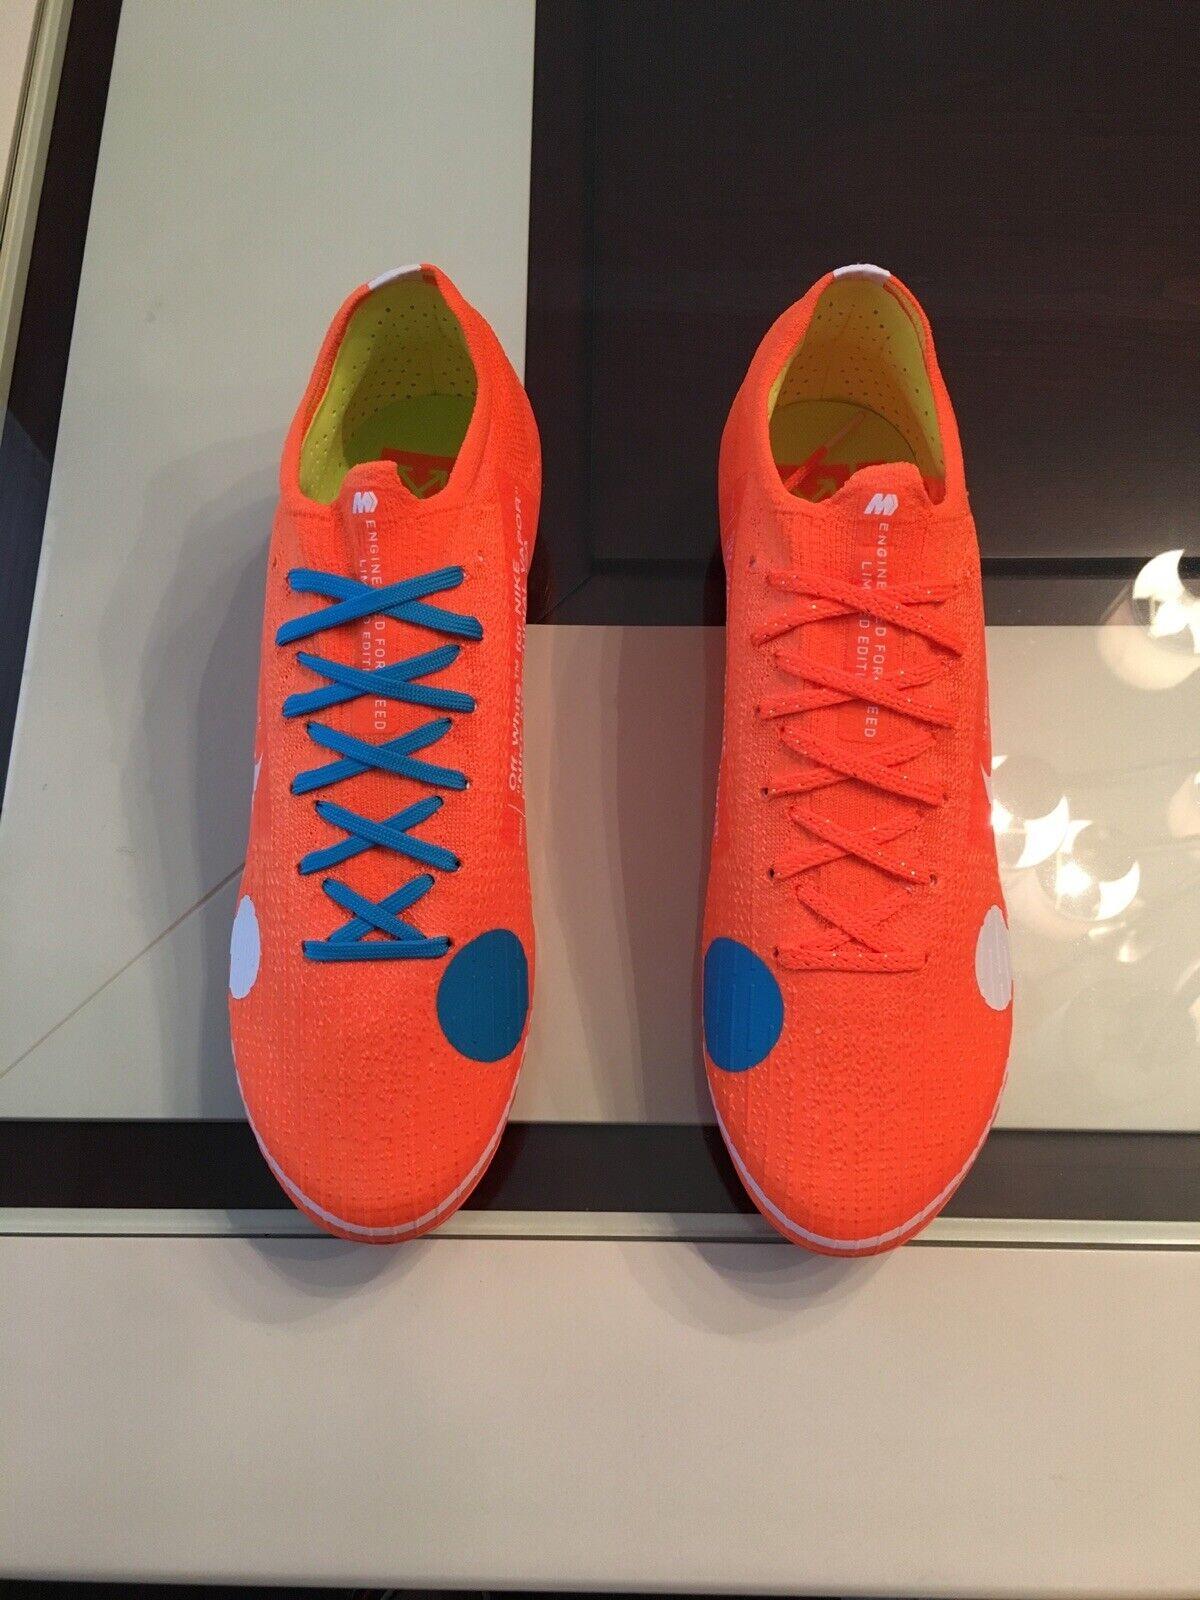 super popular 4905f 48f0a Nike off White Mercurial Vapor 360 Elite Cleats Size 9.5 Virgil Abloh Cr7